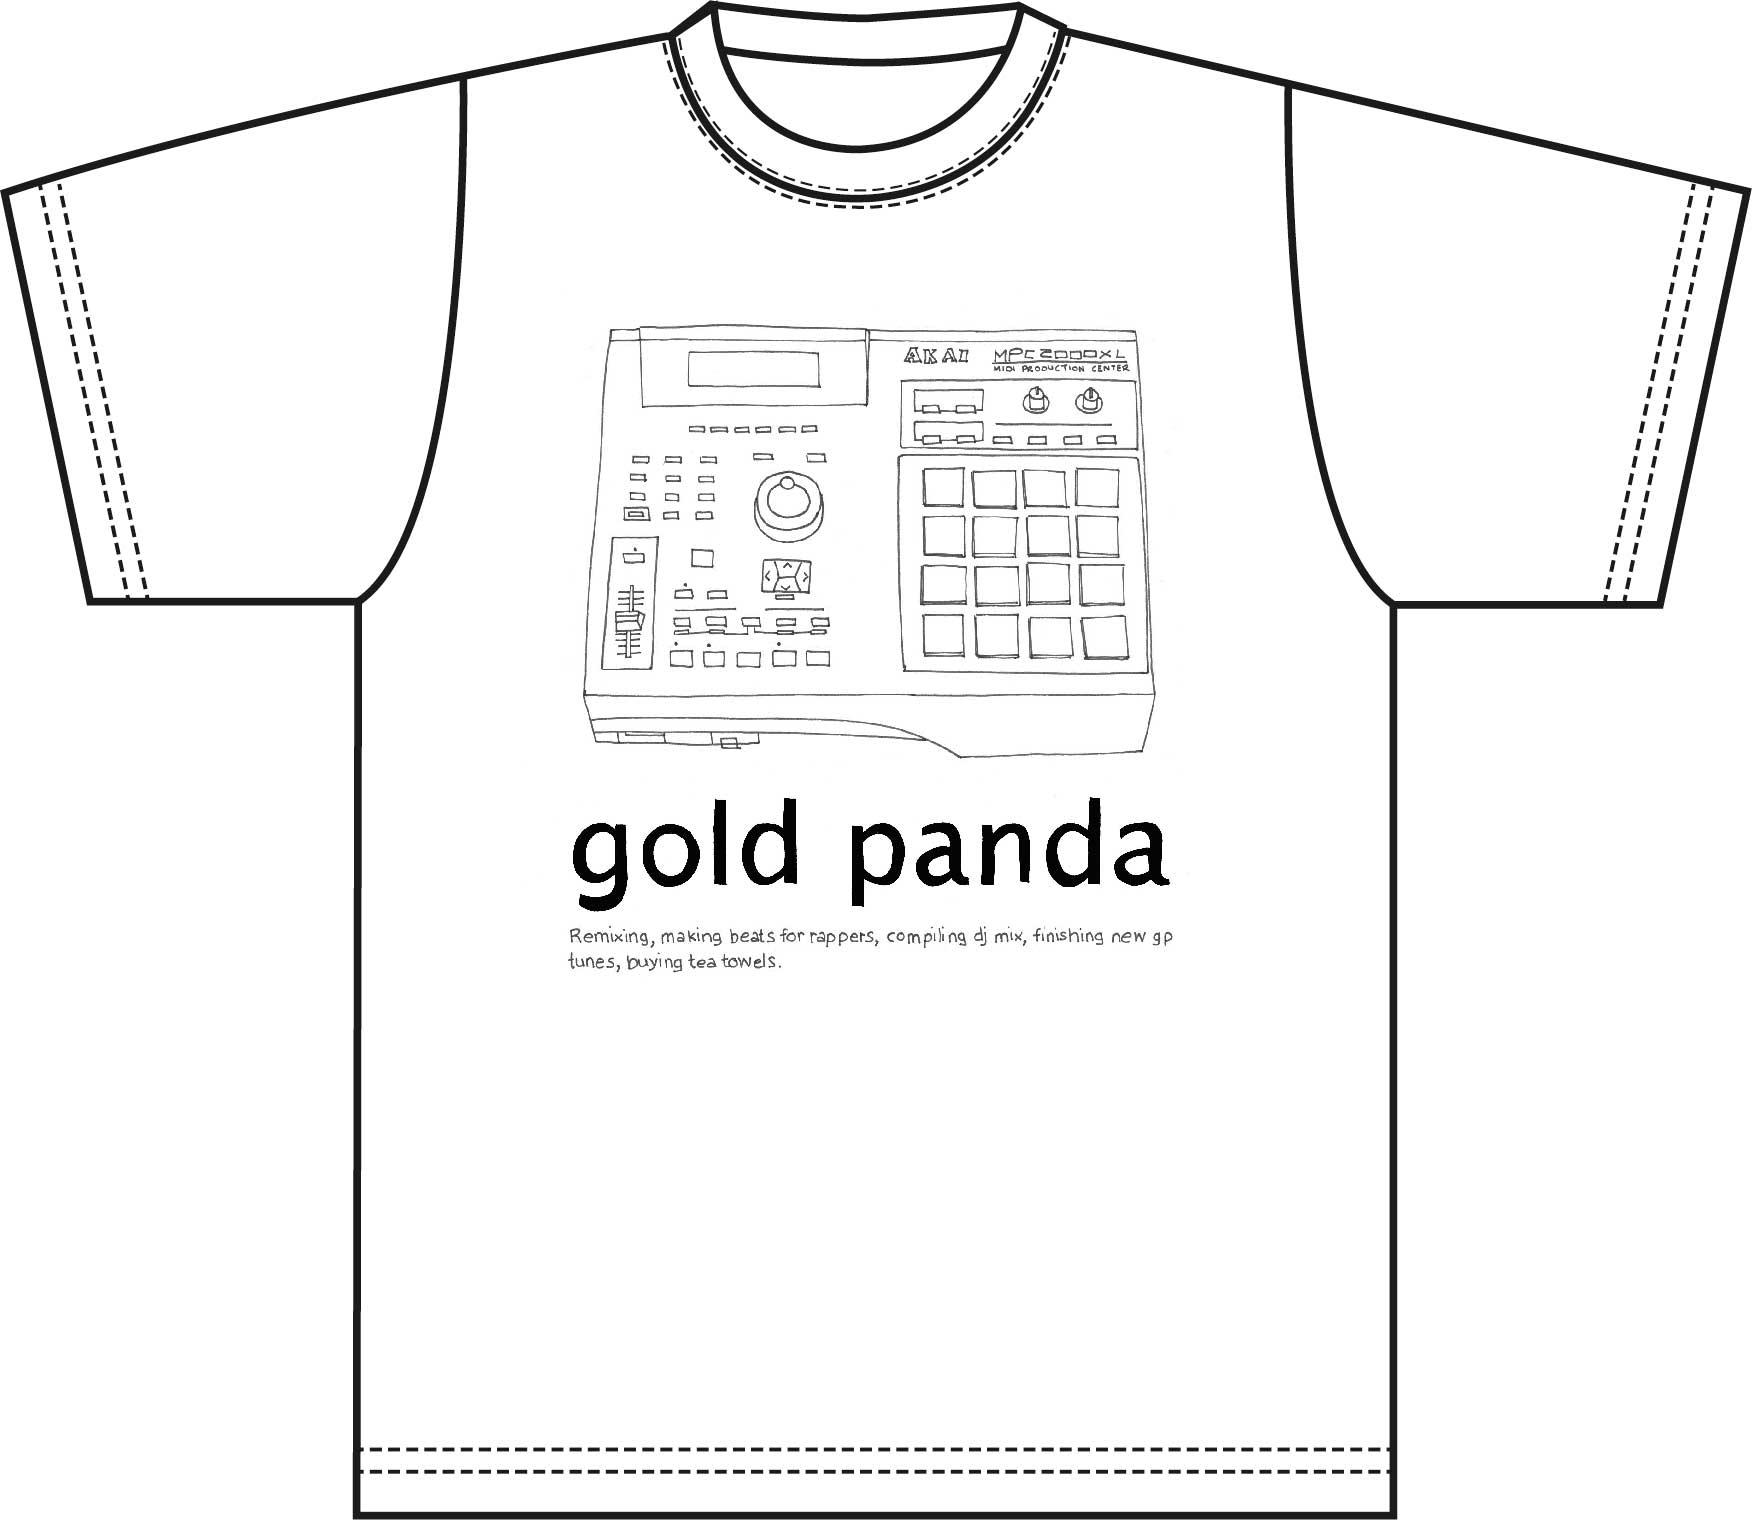 GOLD PANDA_TSHIRTS